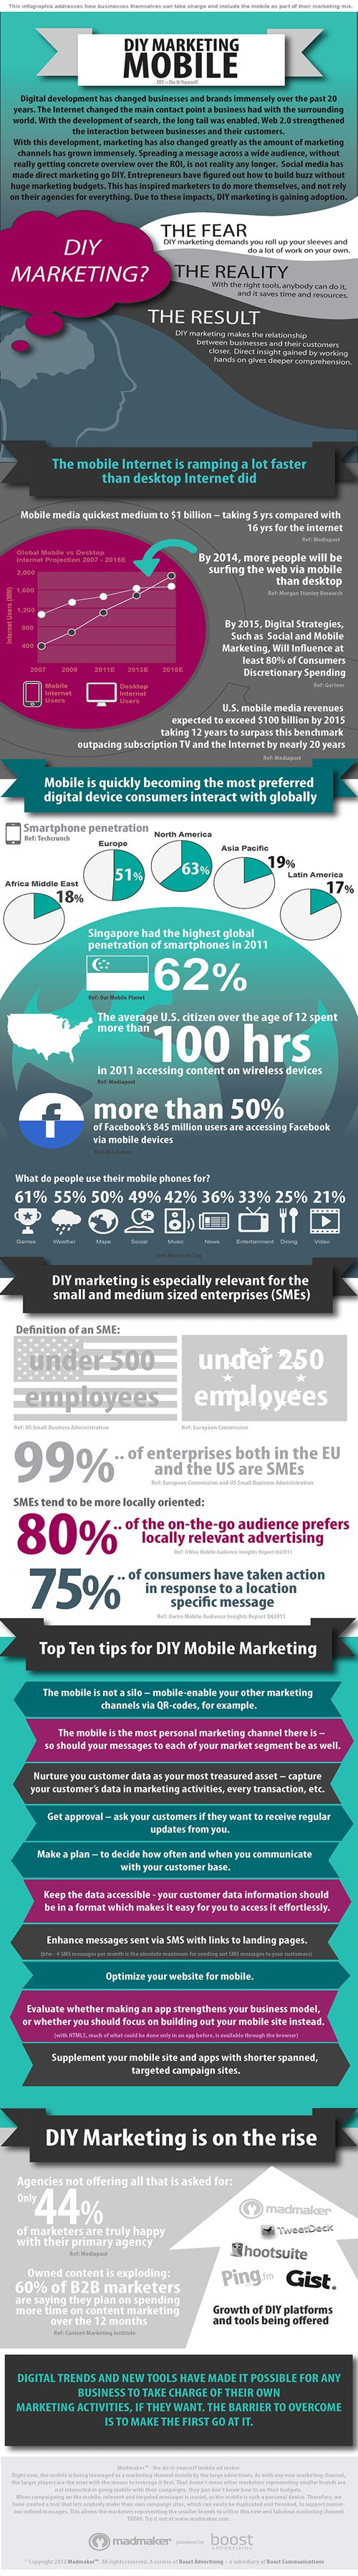 DIY Marketing: Mobile#Infographic